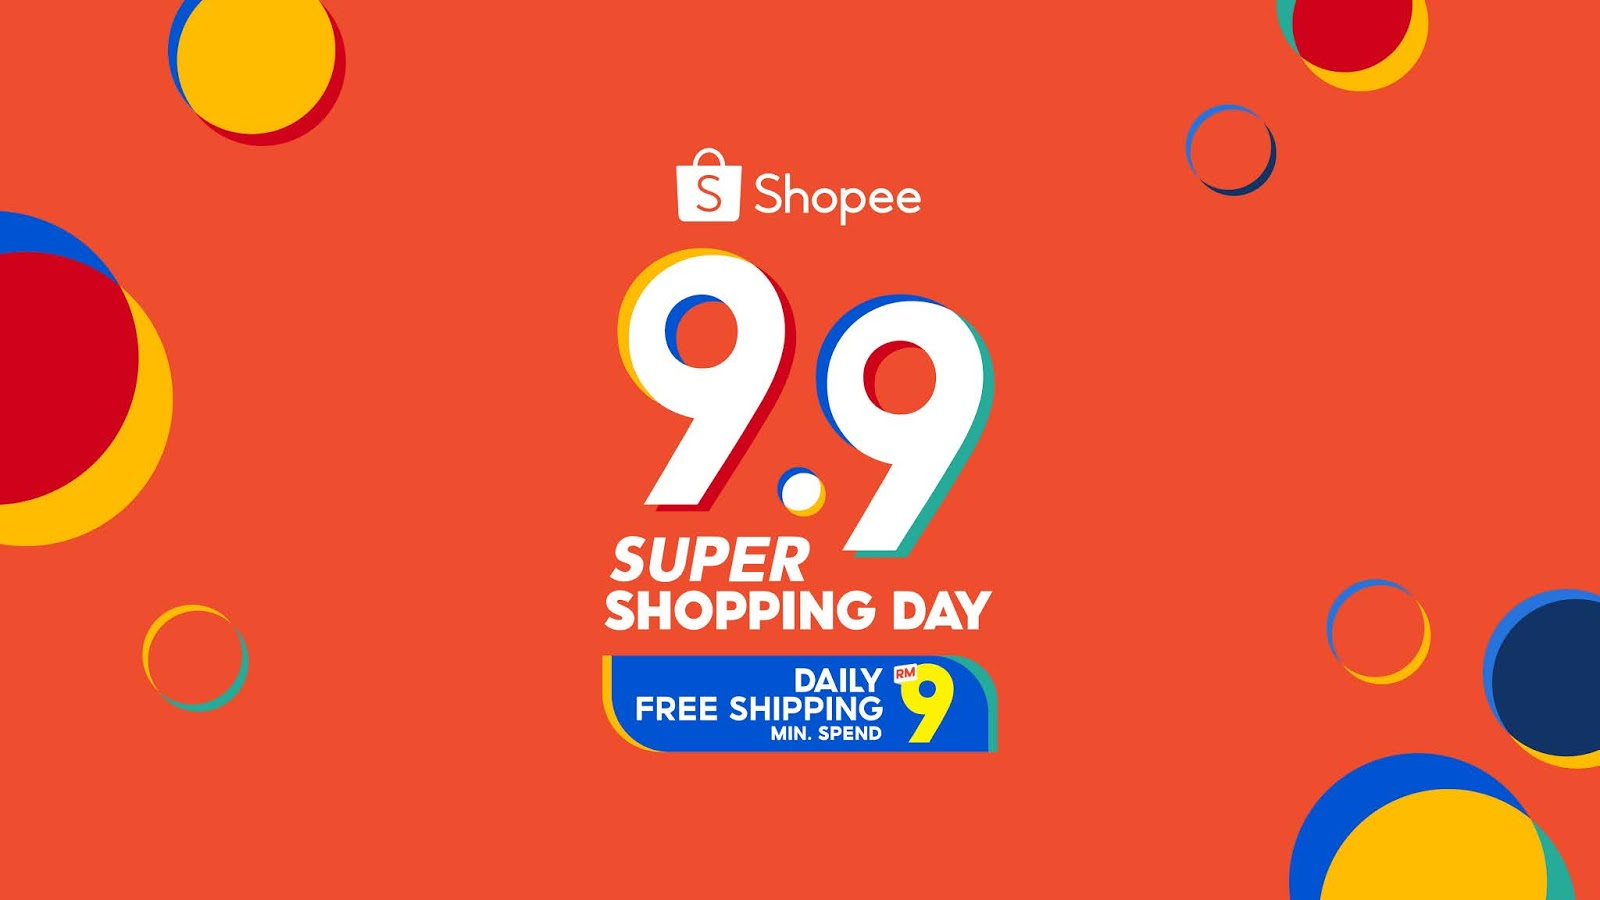 Shopee 9.9 Super Shopping Day - PENJANA Shop Malaysia Online Campaign